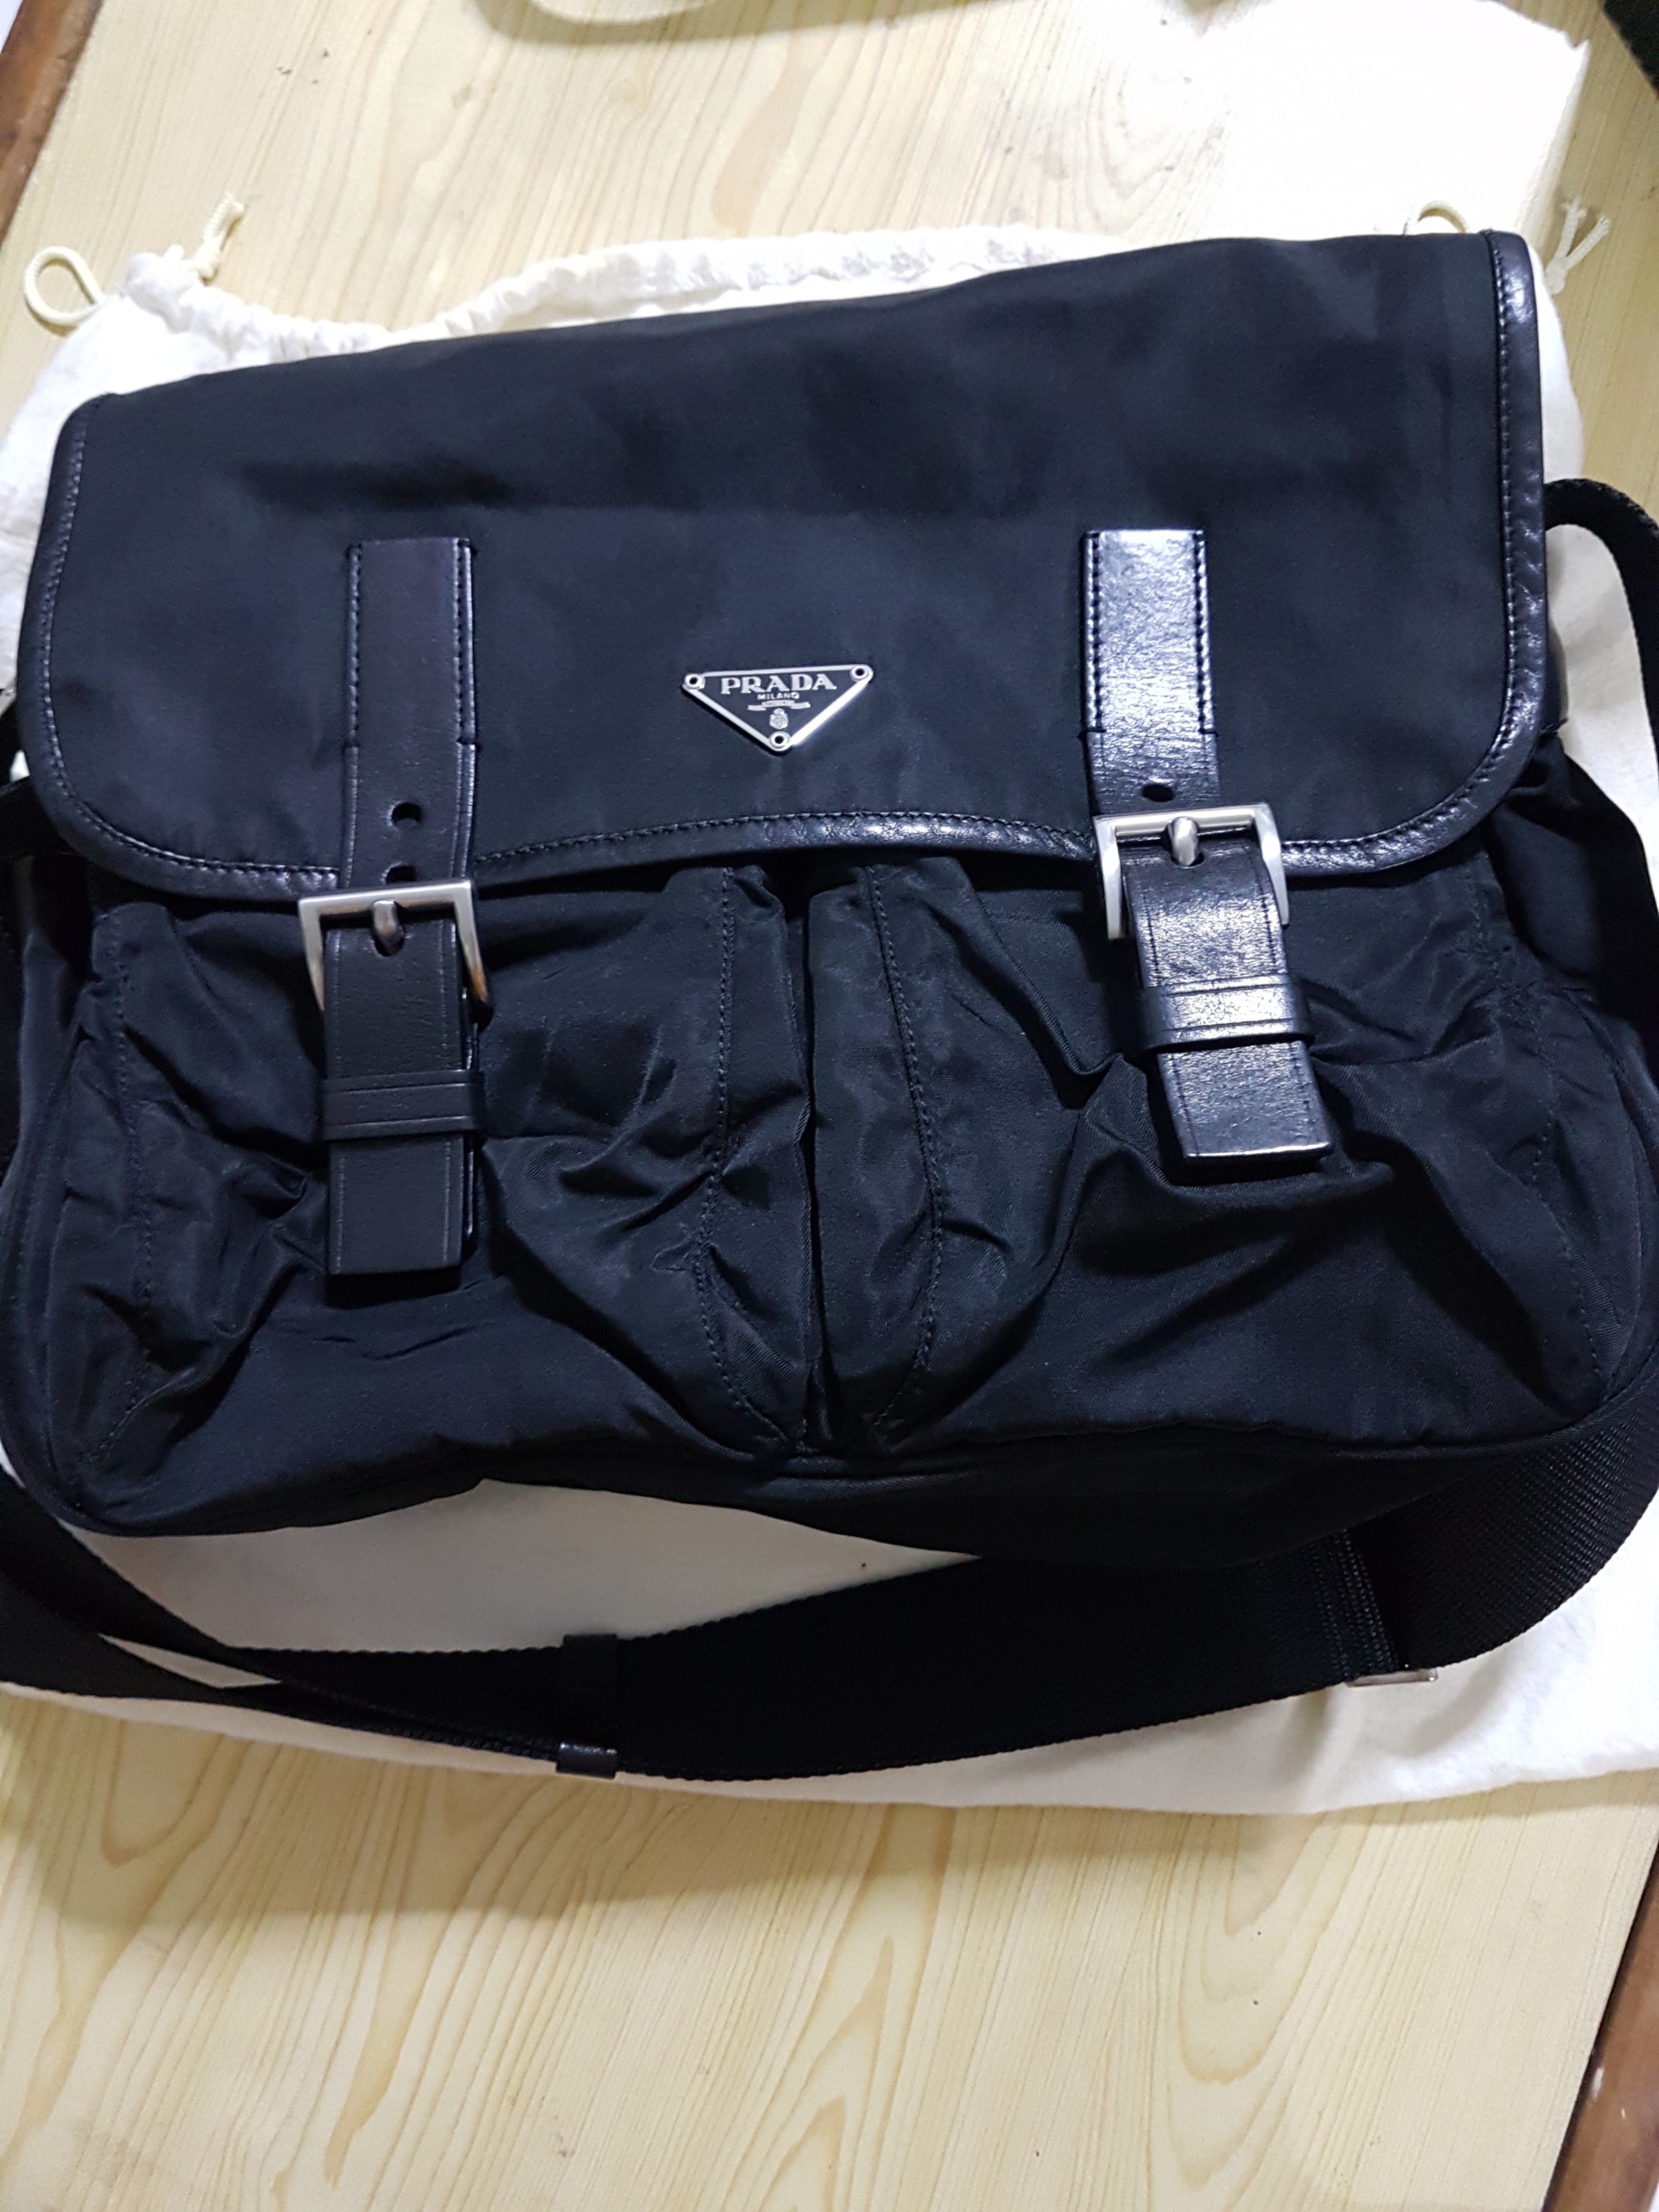 8c620cebb79b78 Prada sling bag, Luxury, Bags & Wallets, Sling Bags on Carousell